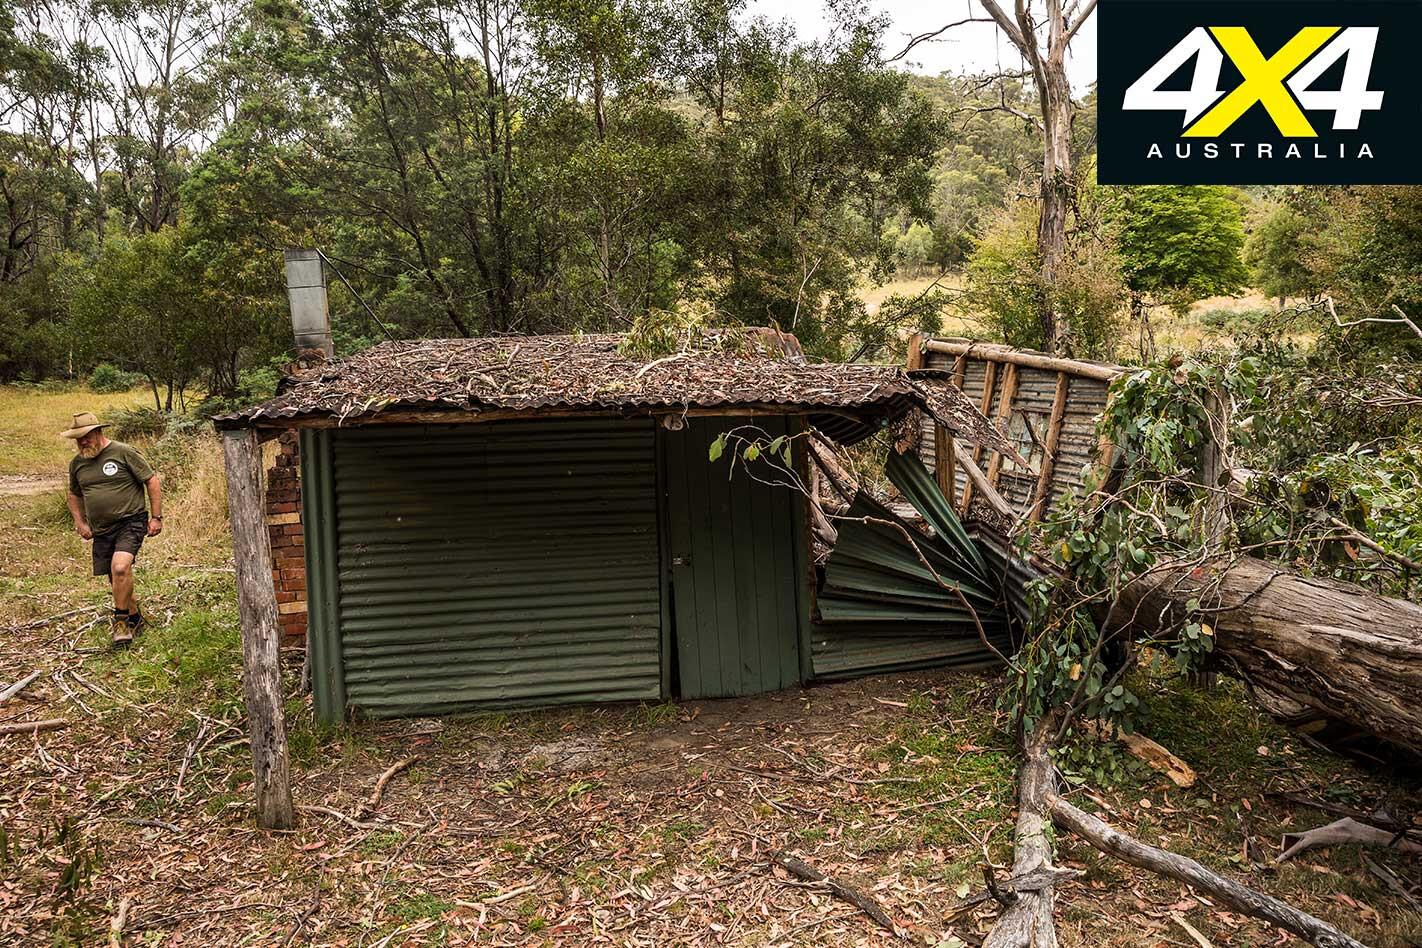 Victorian High Country 4 X 4 Adventure Series PO Hut Jpg